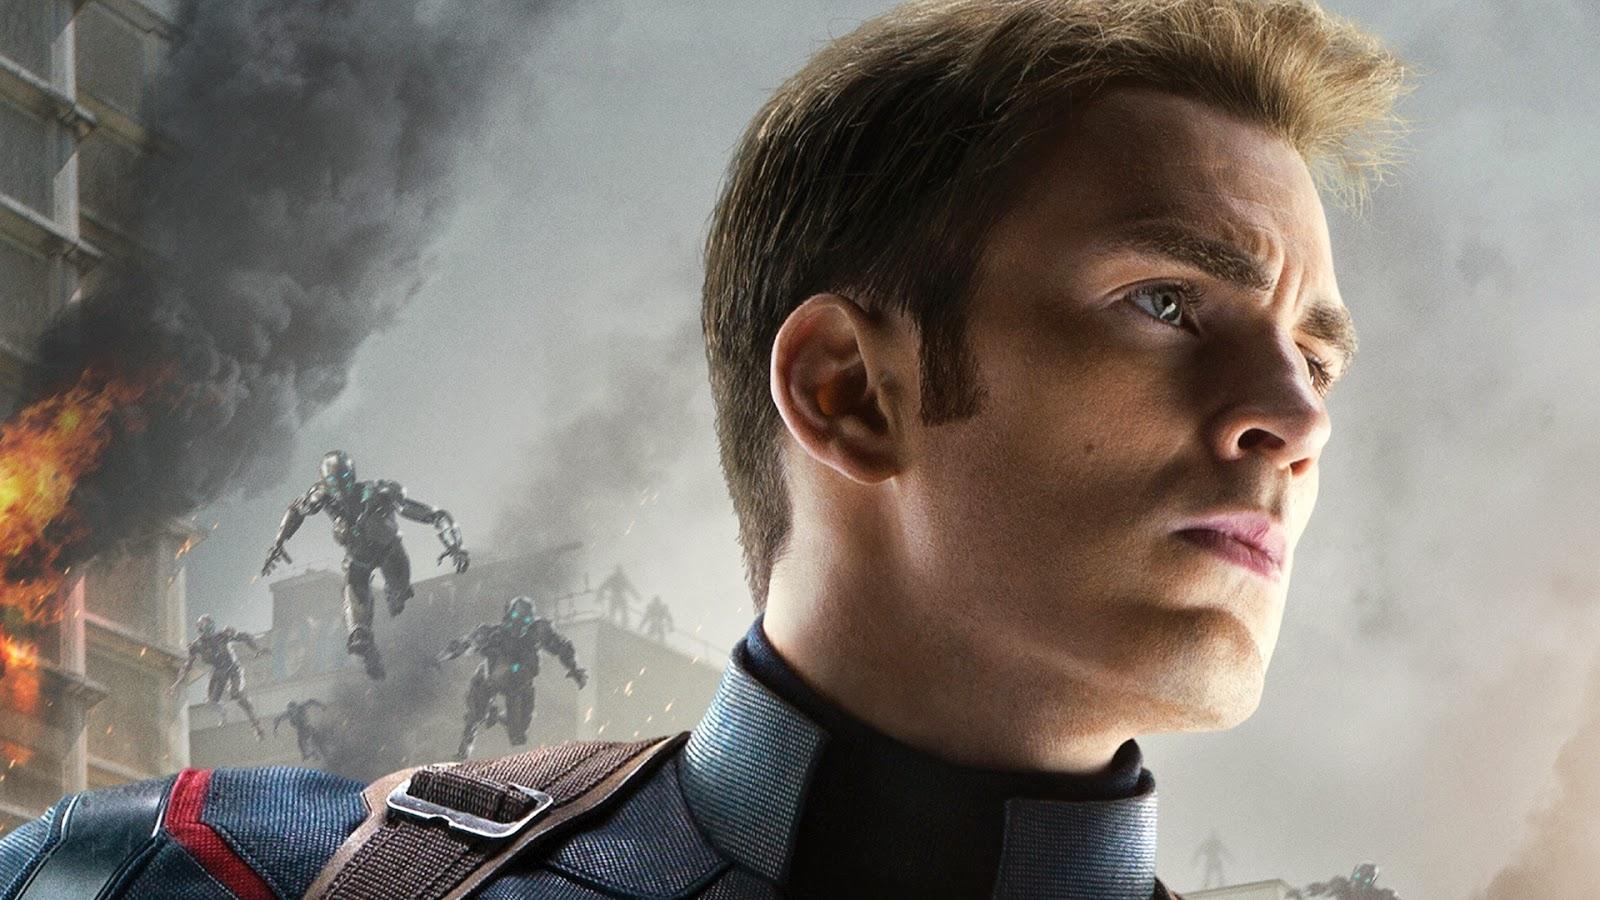 captain america avengers age of ultron wallpapers - 70 New  Avengers Age Of Ultron  Pics Reveal Vision War